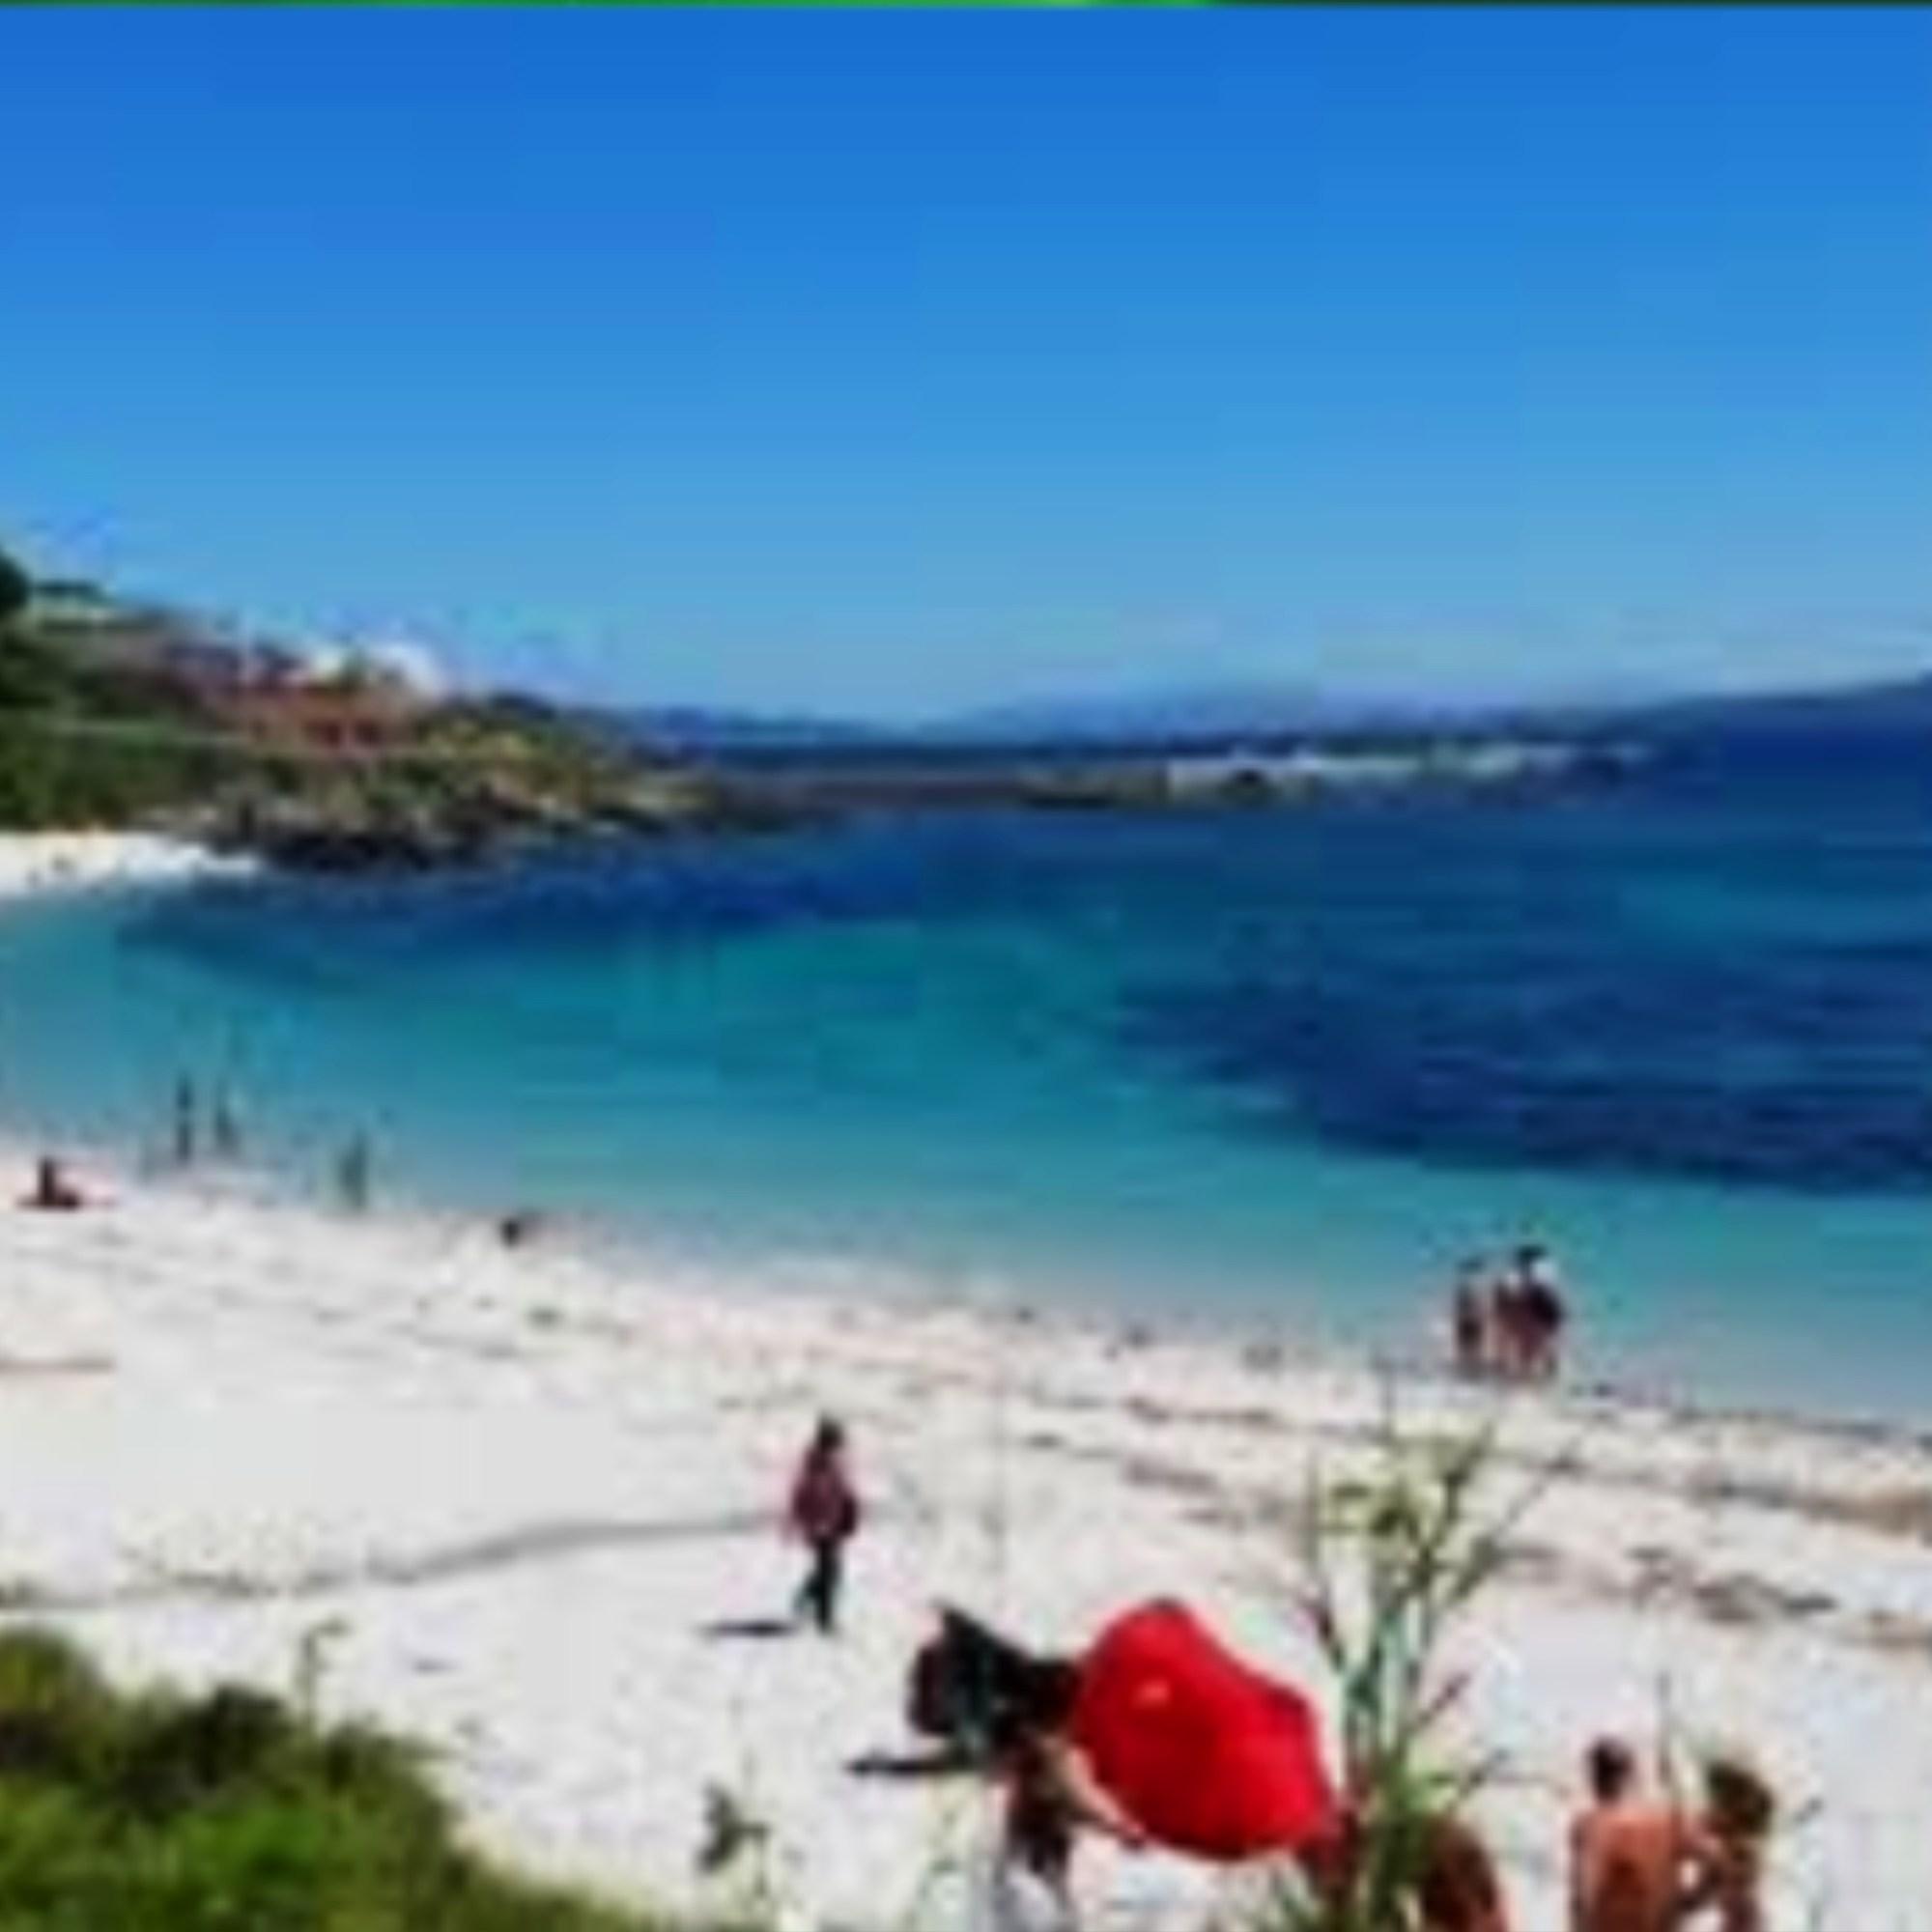 ons-isla-playa-atlantico